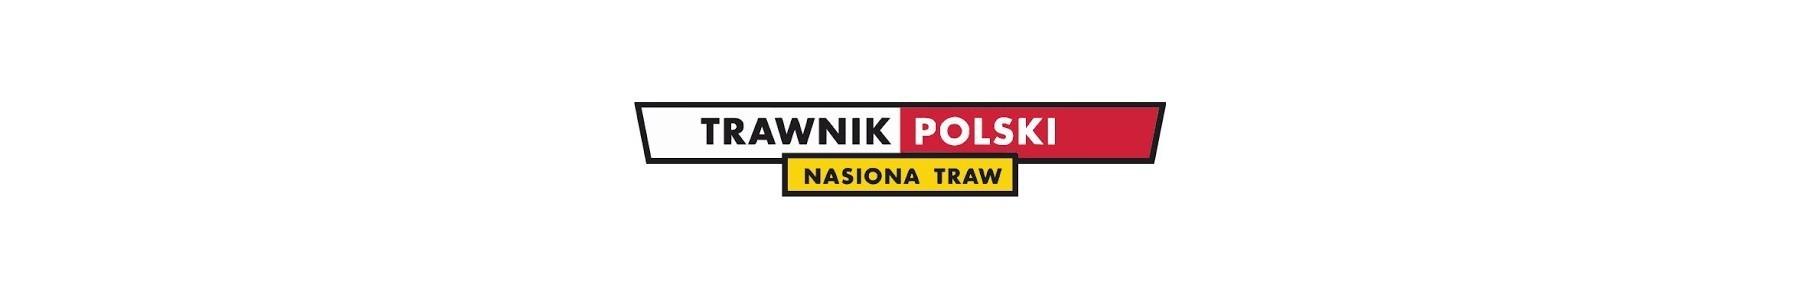 Trawnik Polski